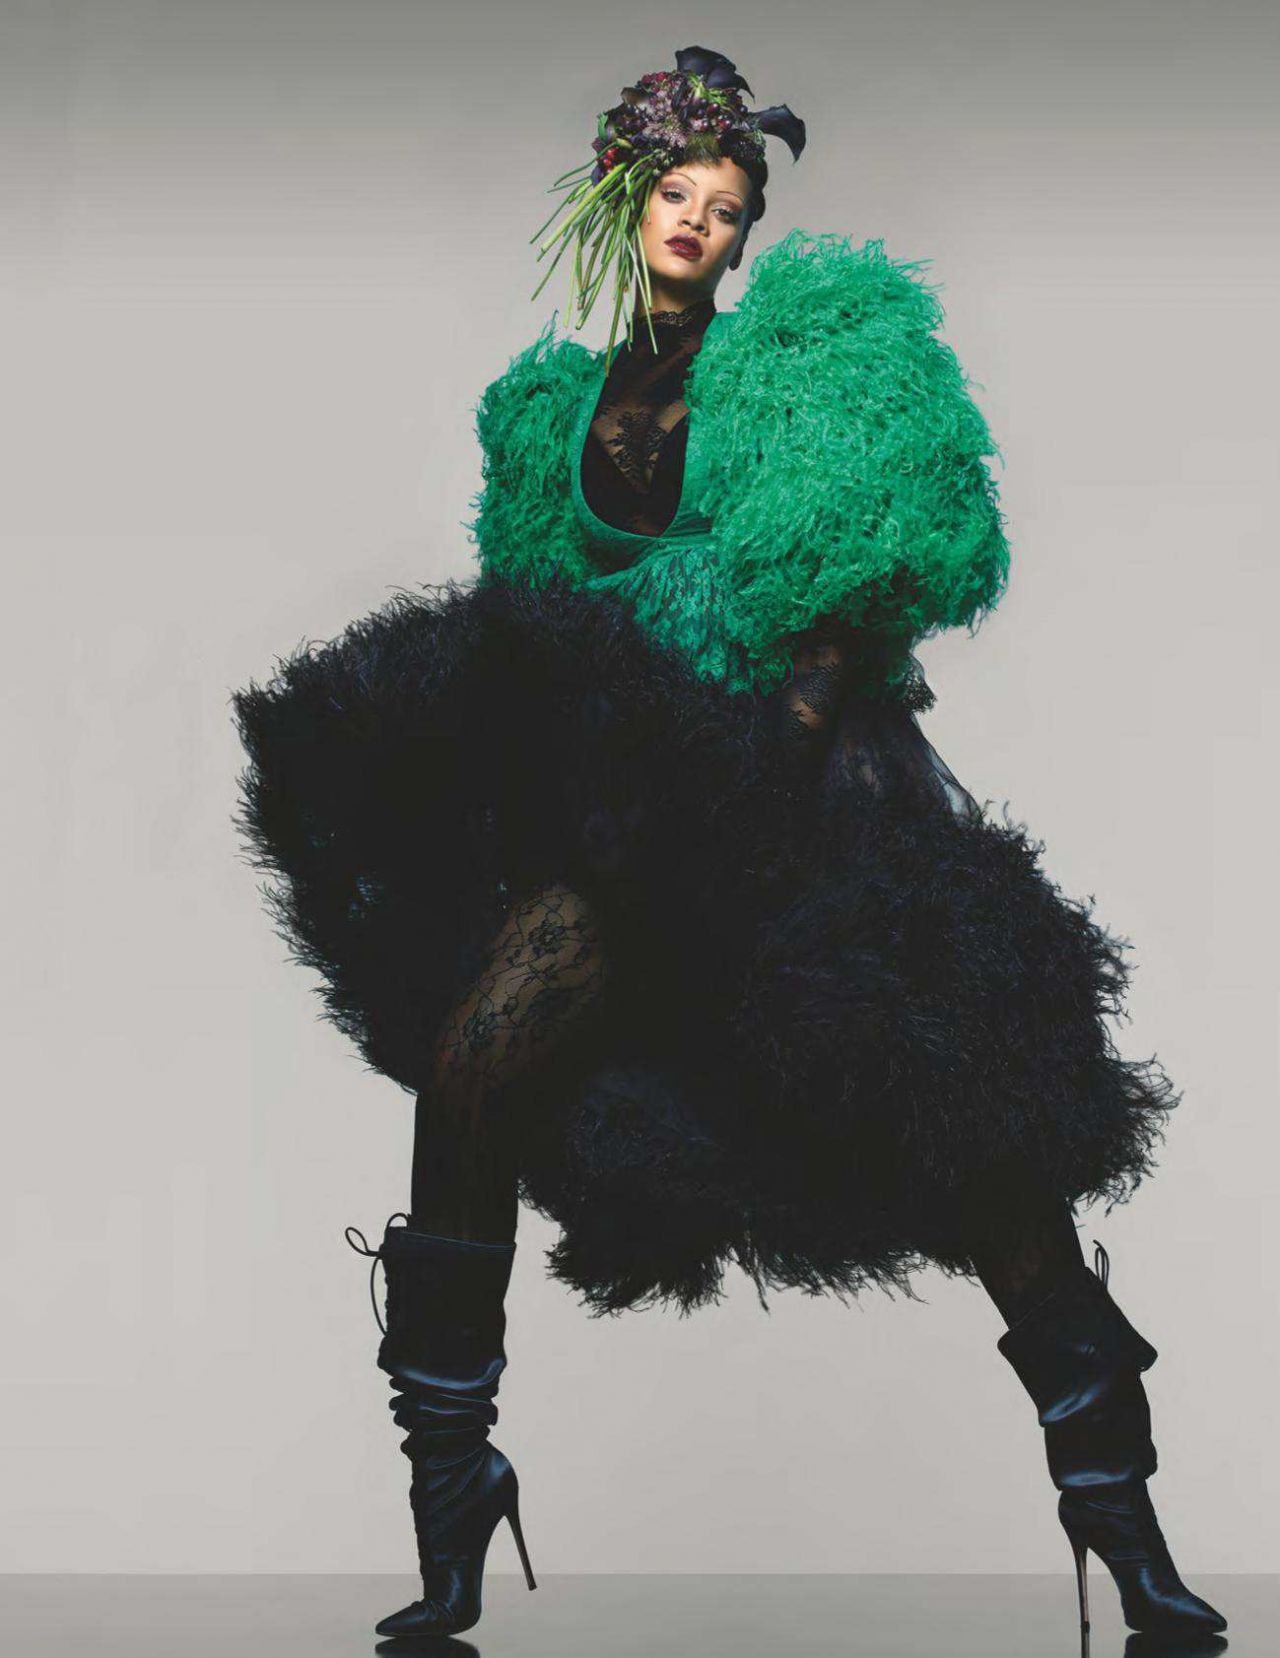 Vogue The Top Selling Fashion Magazine: Rihanna Latest Photos